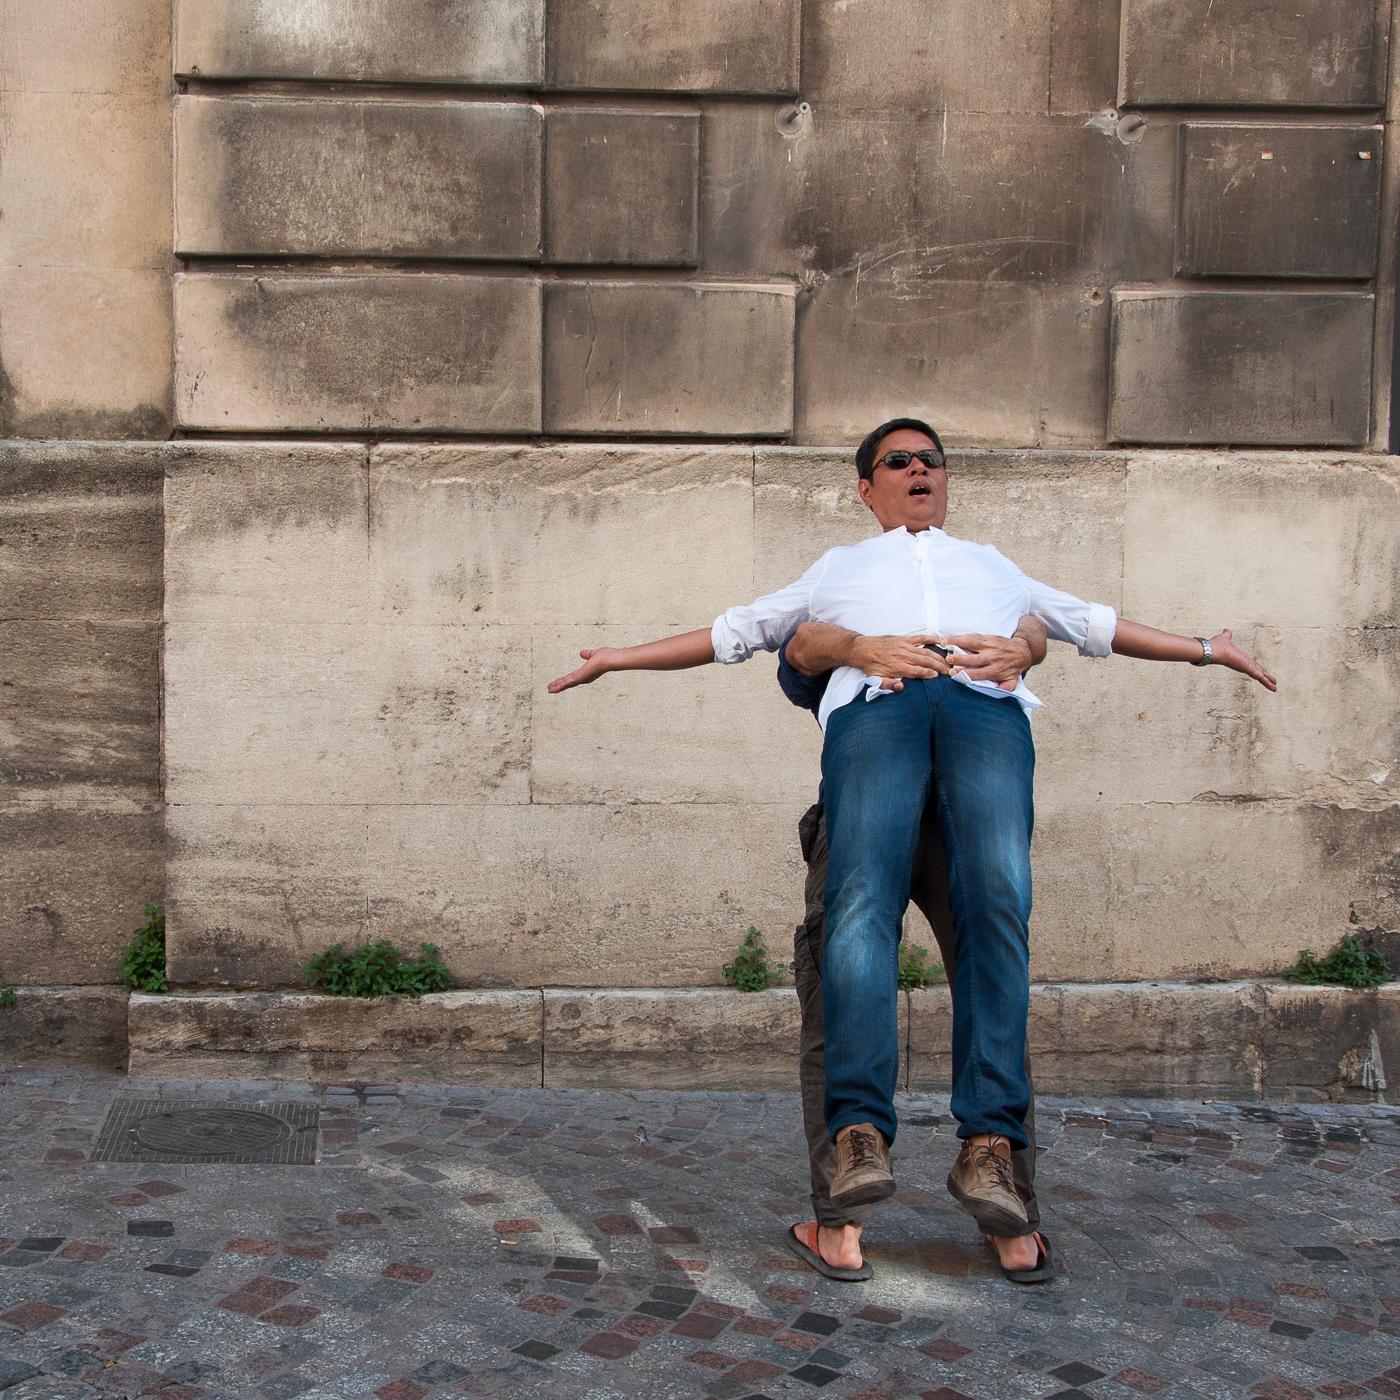 Arles 2015 - Oh